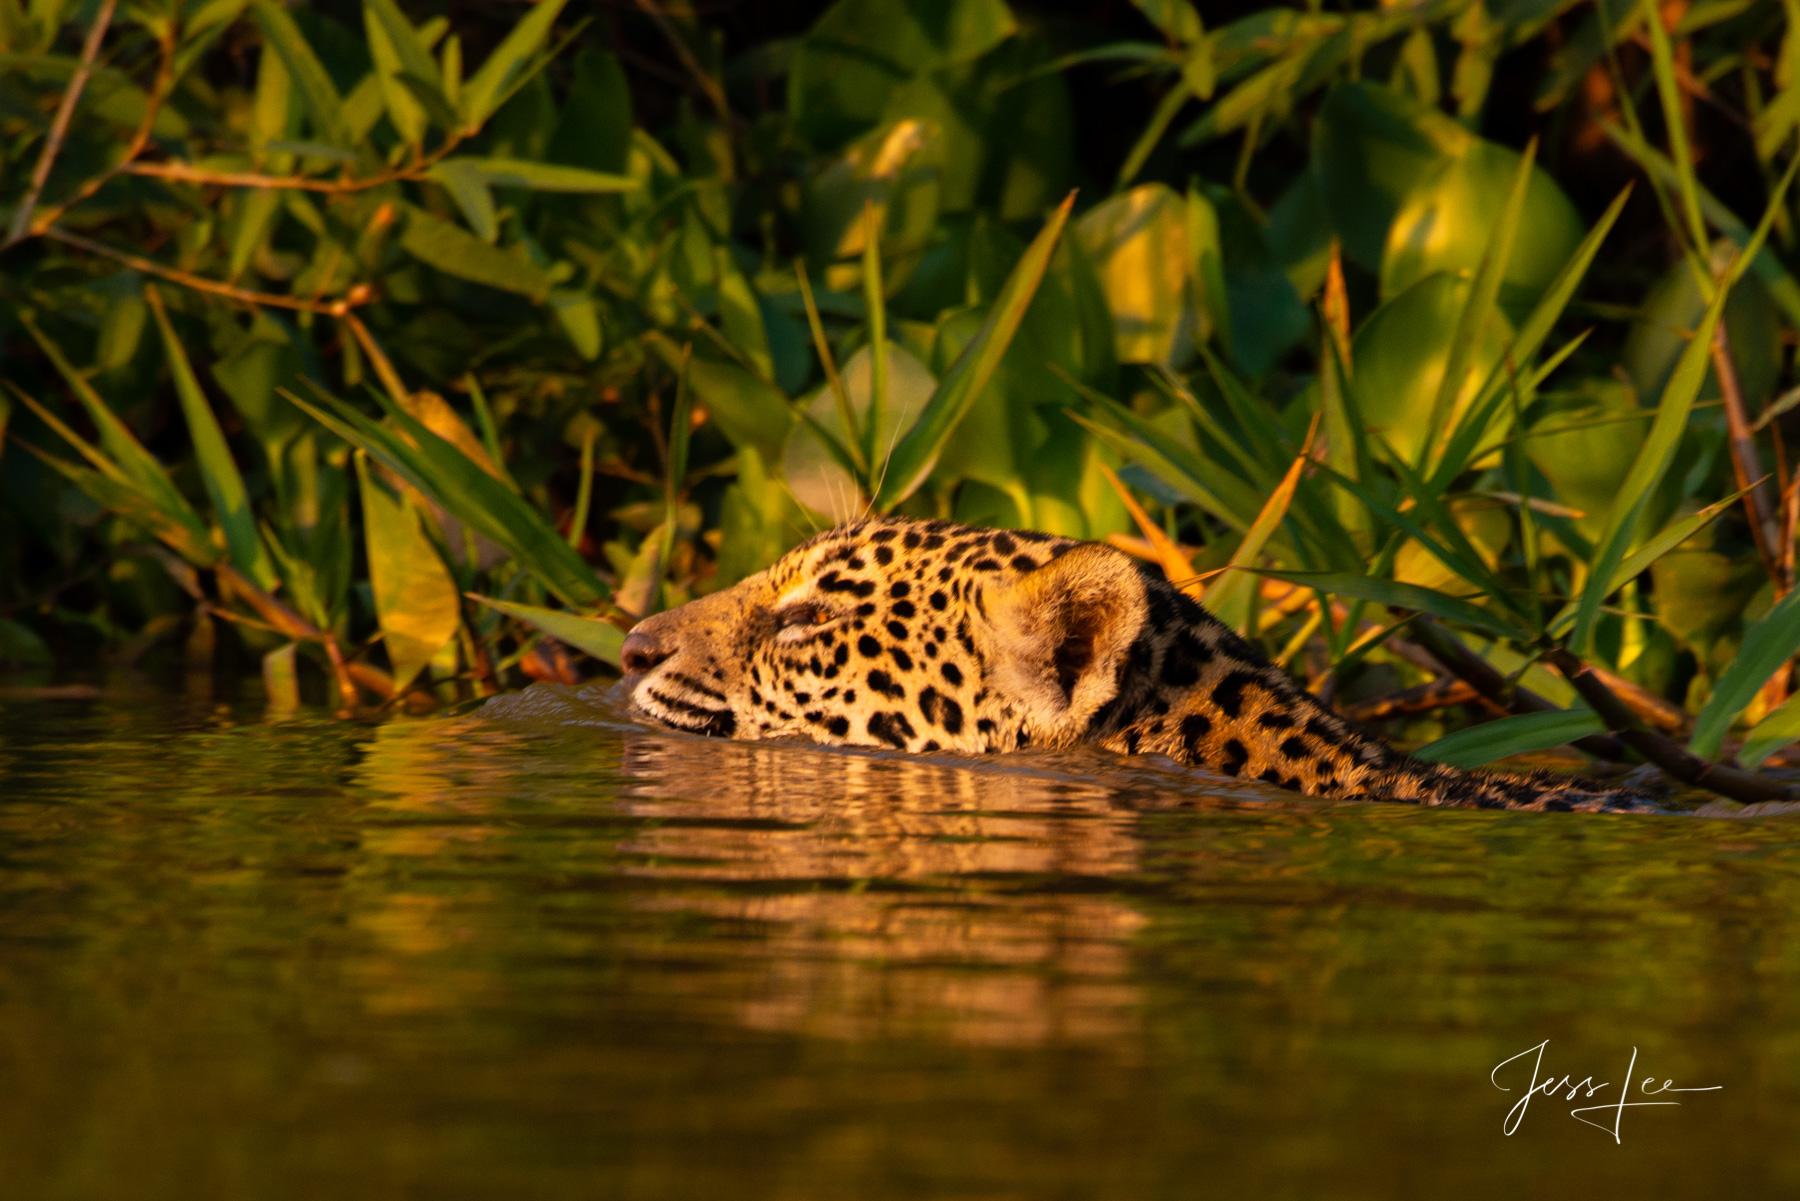 predator, cat, feline, wildlife, hunter, amazon, south America, big cat, copyright, jess lee, photographer,, photo